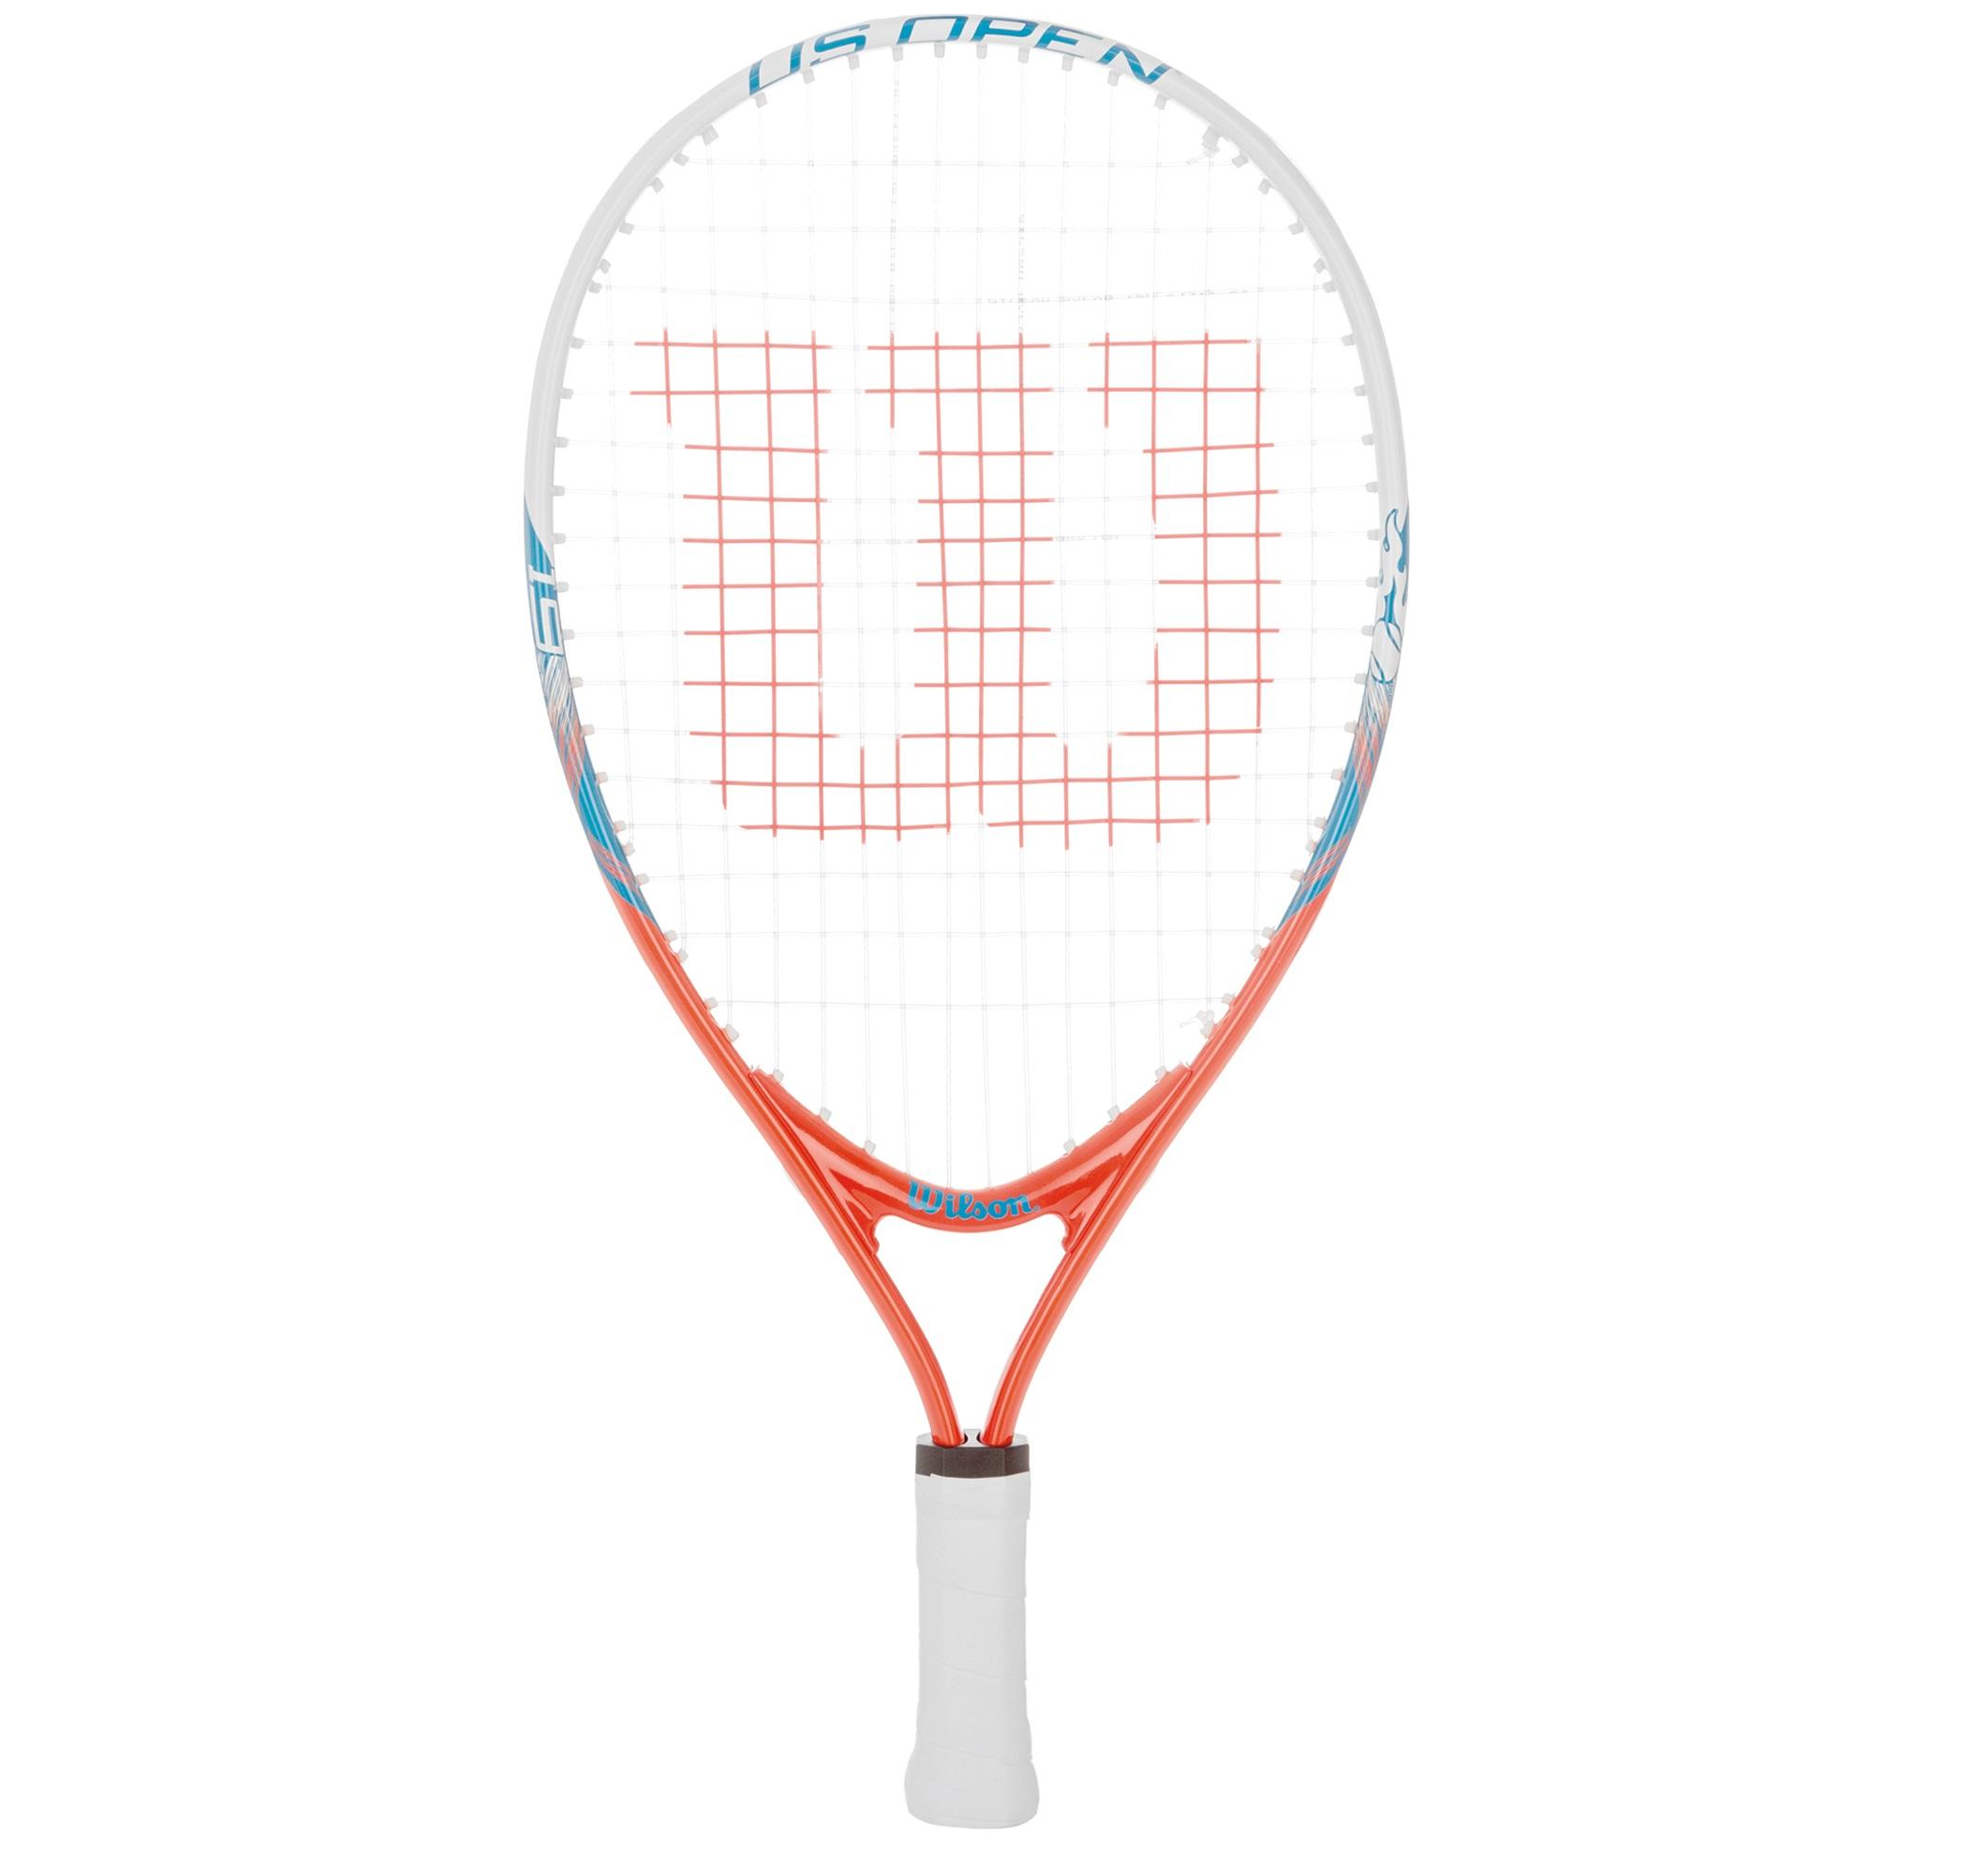 Wilson Ракетка для большого тенниса детская Wilson US Open 19, размер Без размера wilson набор мячей для большого тенниса wilson us open x3 размер без размера